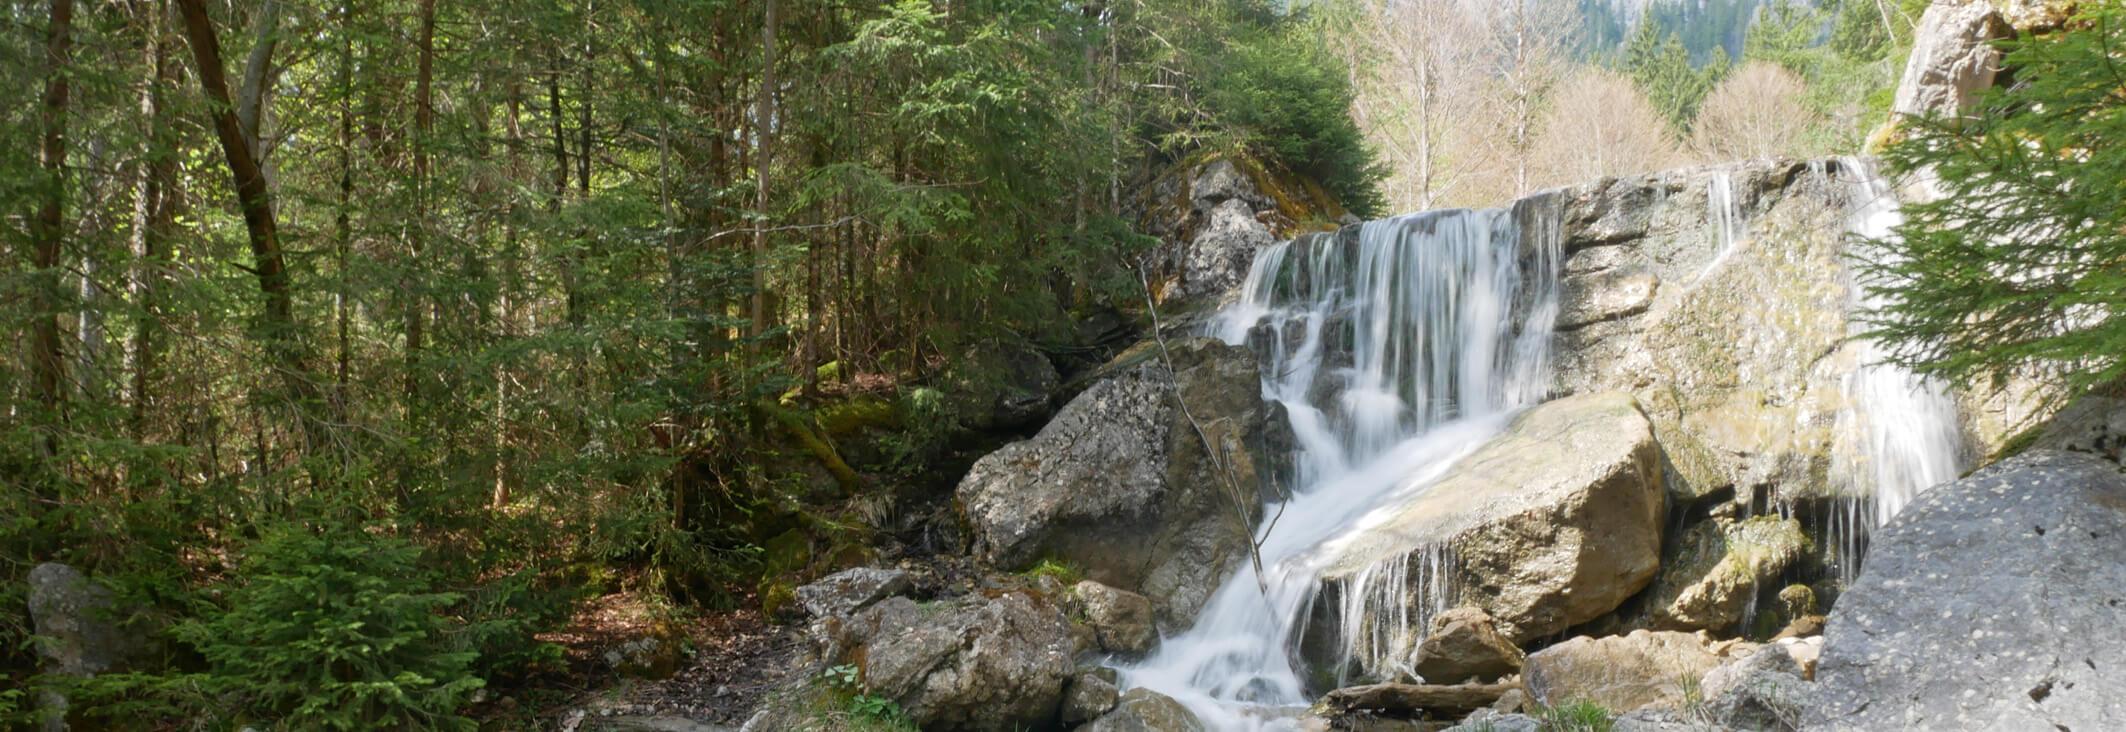 Brunnenkopf Linderhof Wasserfall